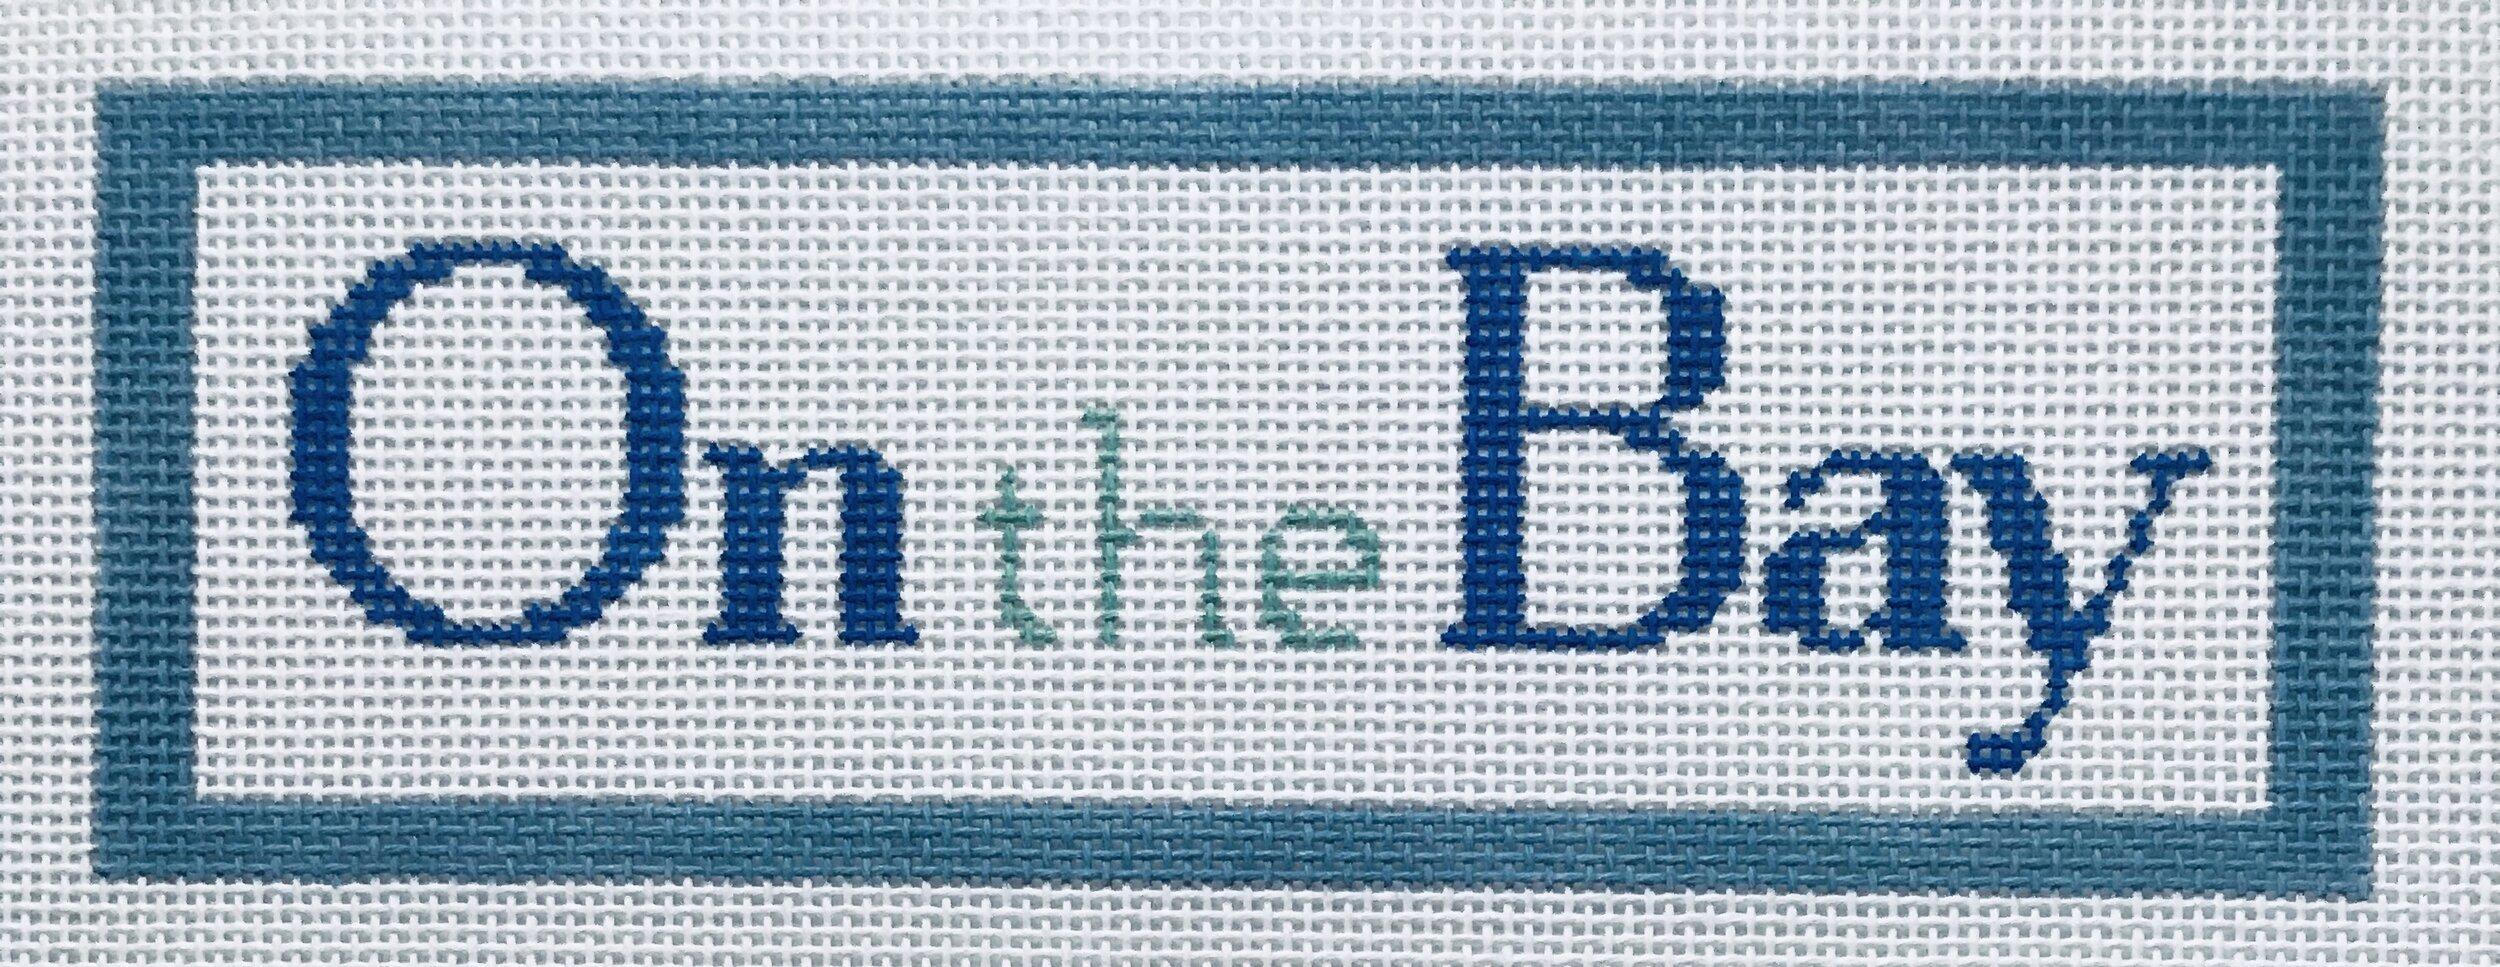 "On the Bay AL53   8"" x 2.75"" on 14 mesh"